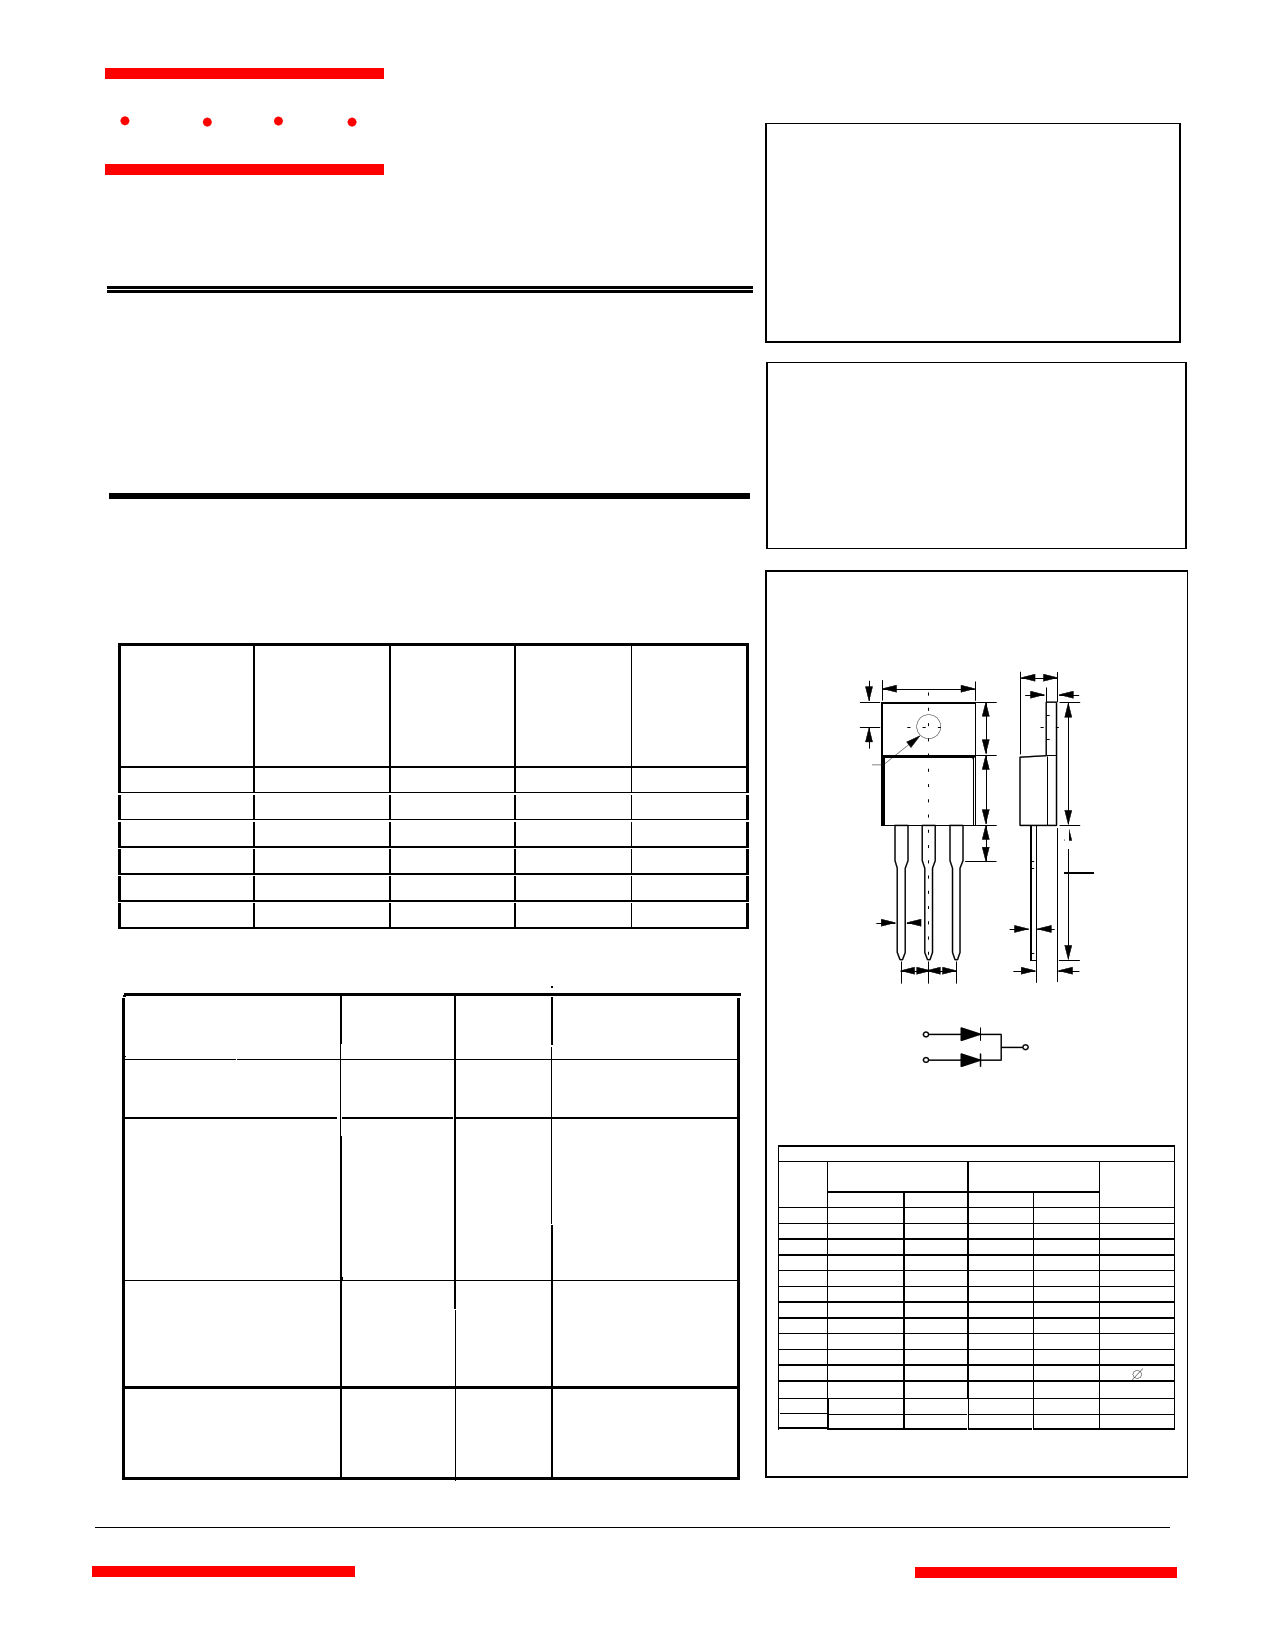 MBR1035CT datasheet